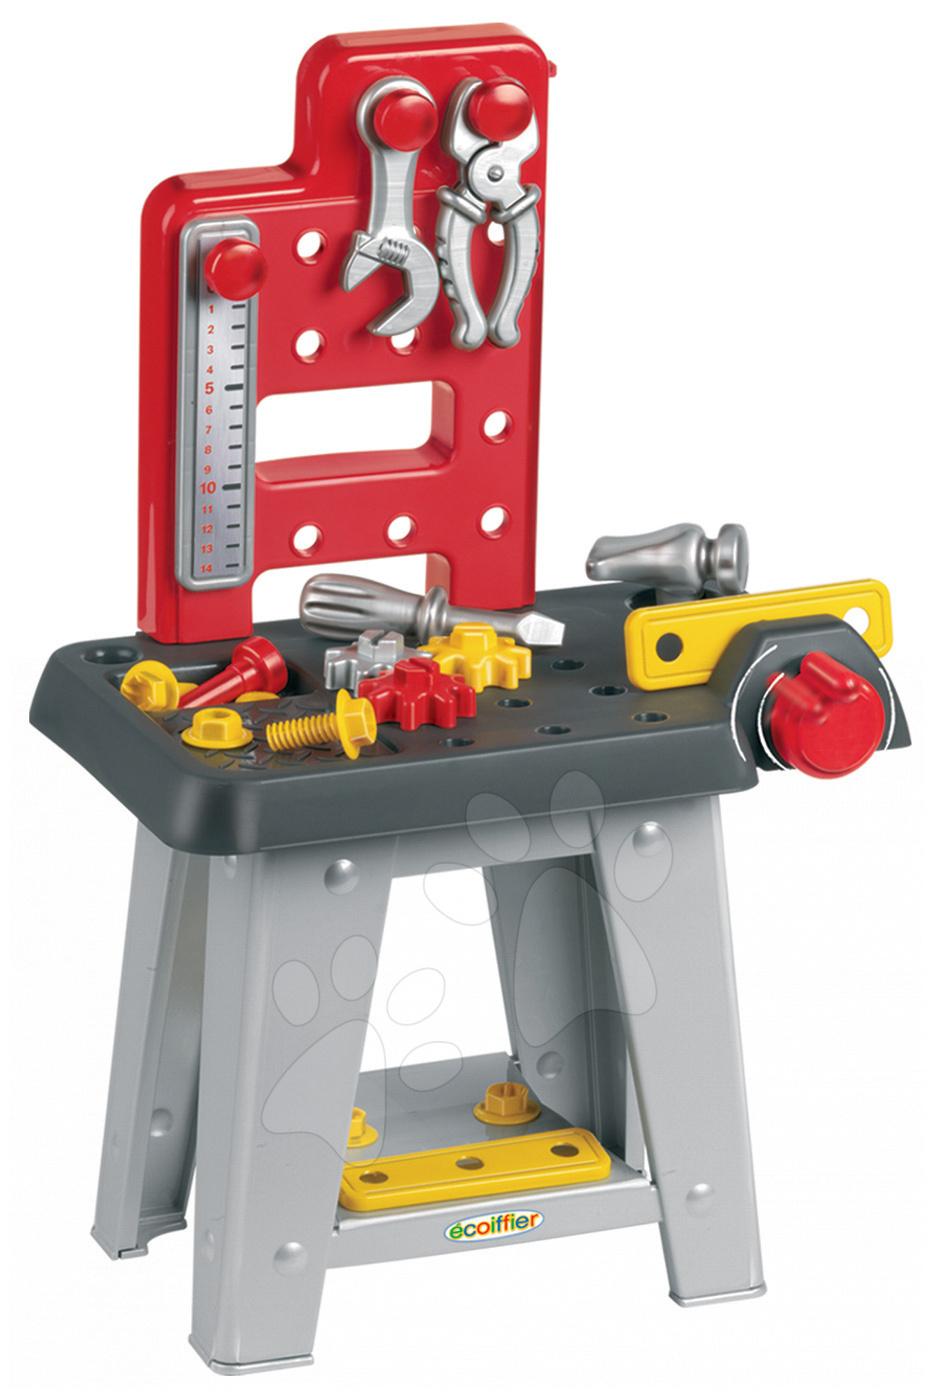 Écoiffier O2304 Mecanique pracovný stolík 25 ks 8*24,5*60 cm